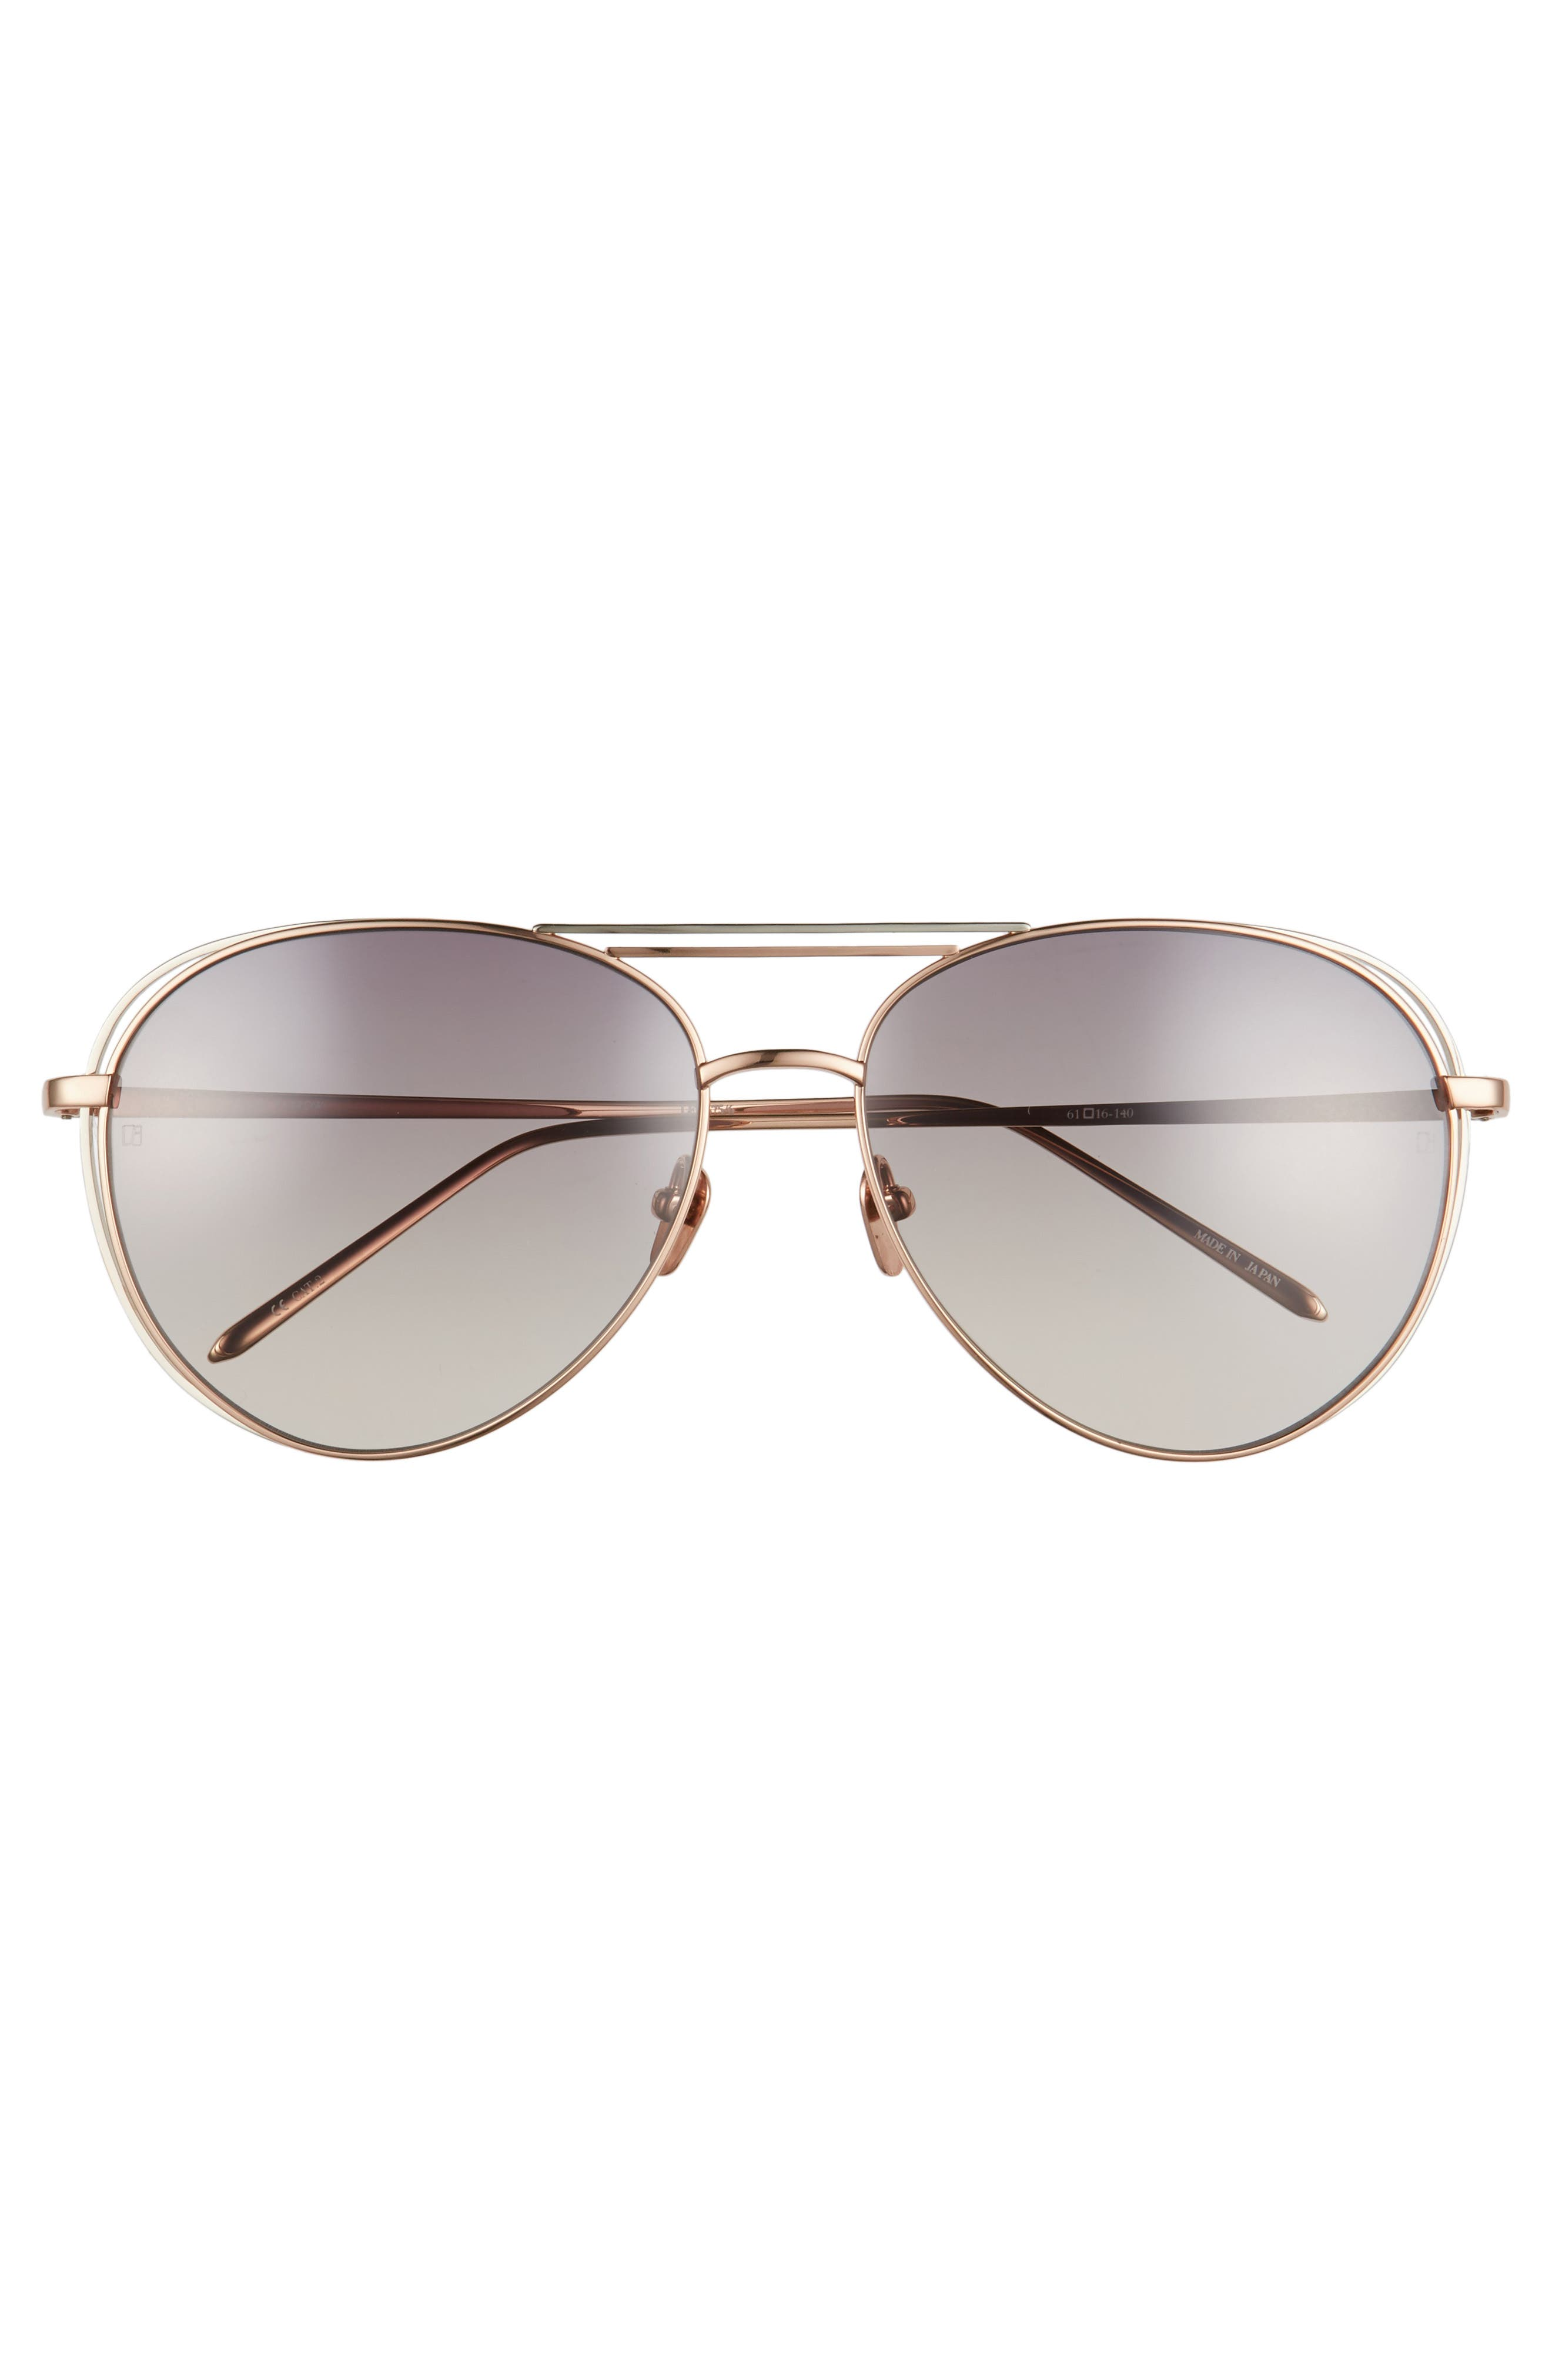 61mm 18 Karat Gold Aviator Sunglasses,                             Alternate thumbnail 3, color,                             Rose Gold White Gold/ Grey